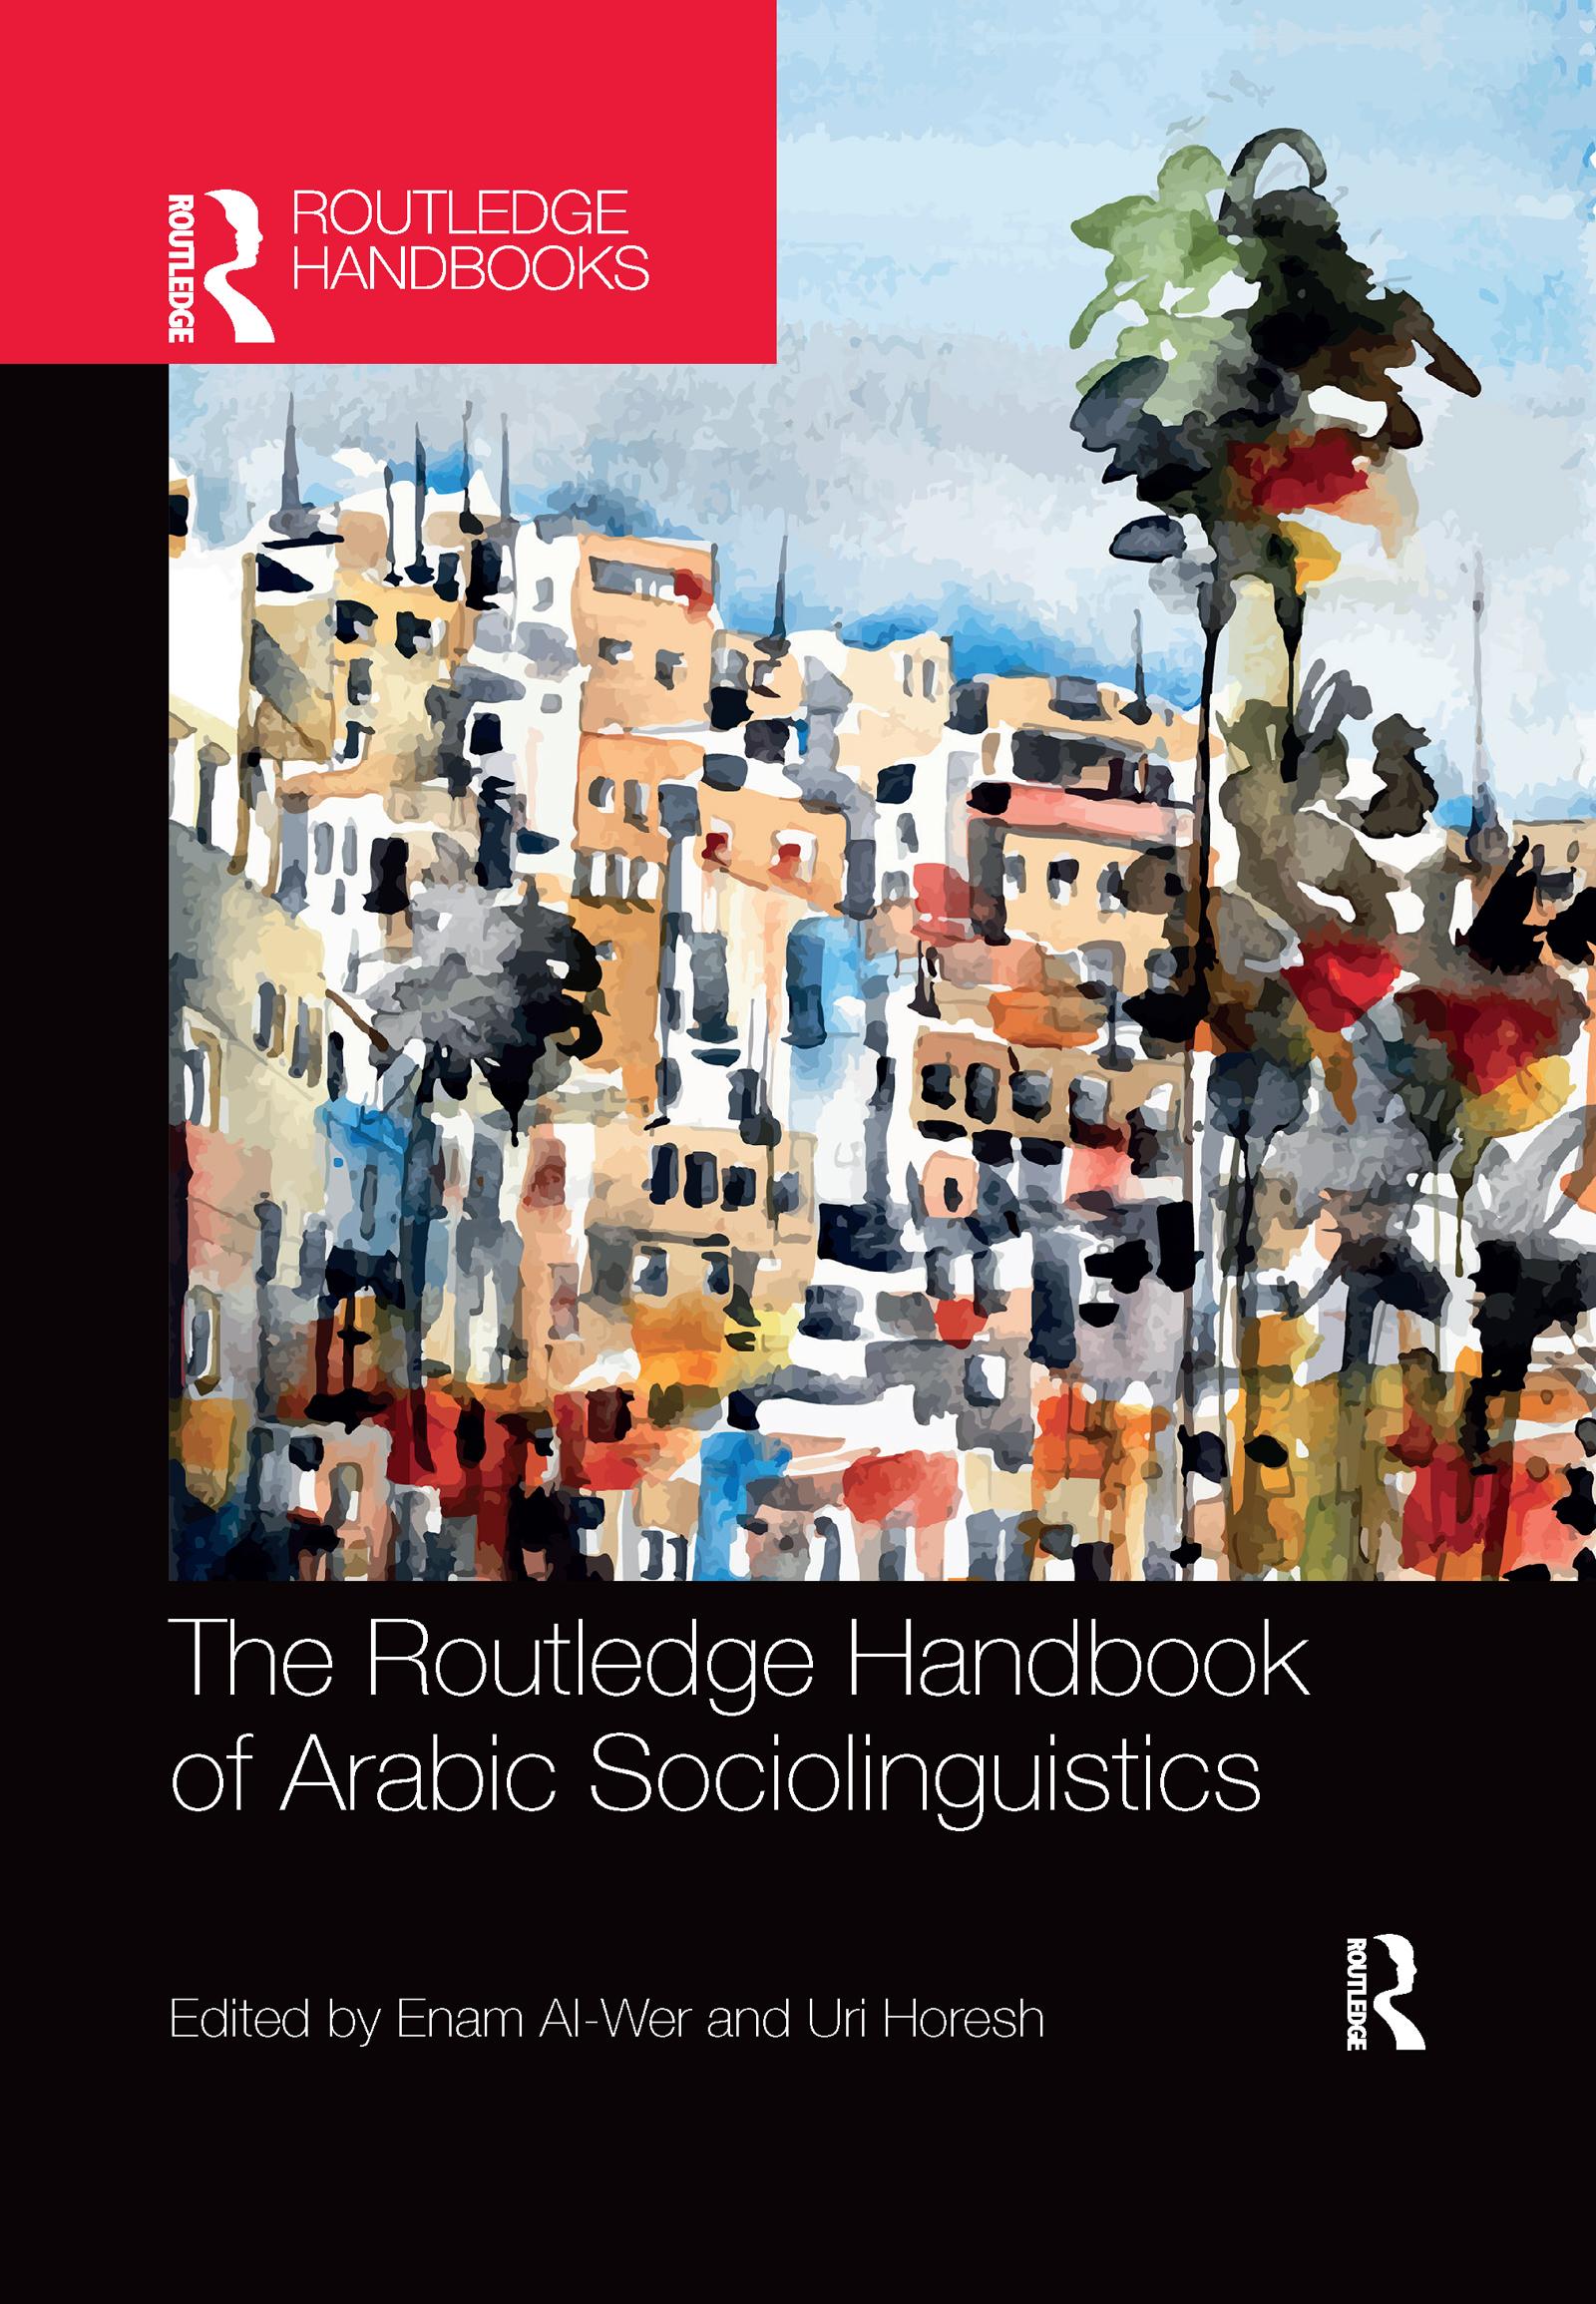 The Routledge Handbook of Arabic Sociolinguistics